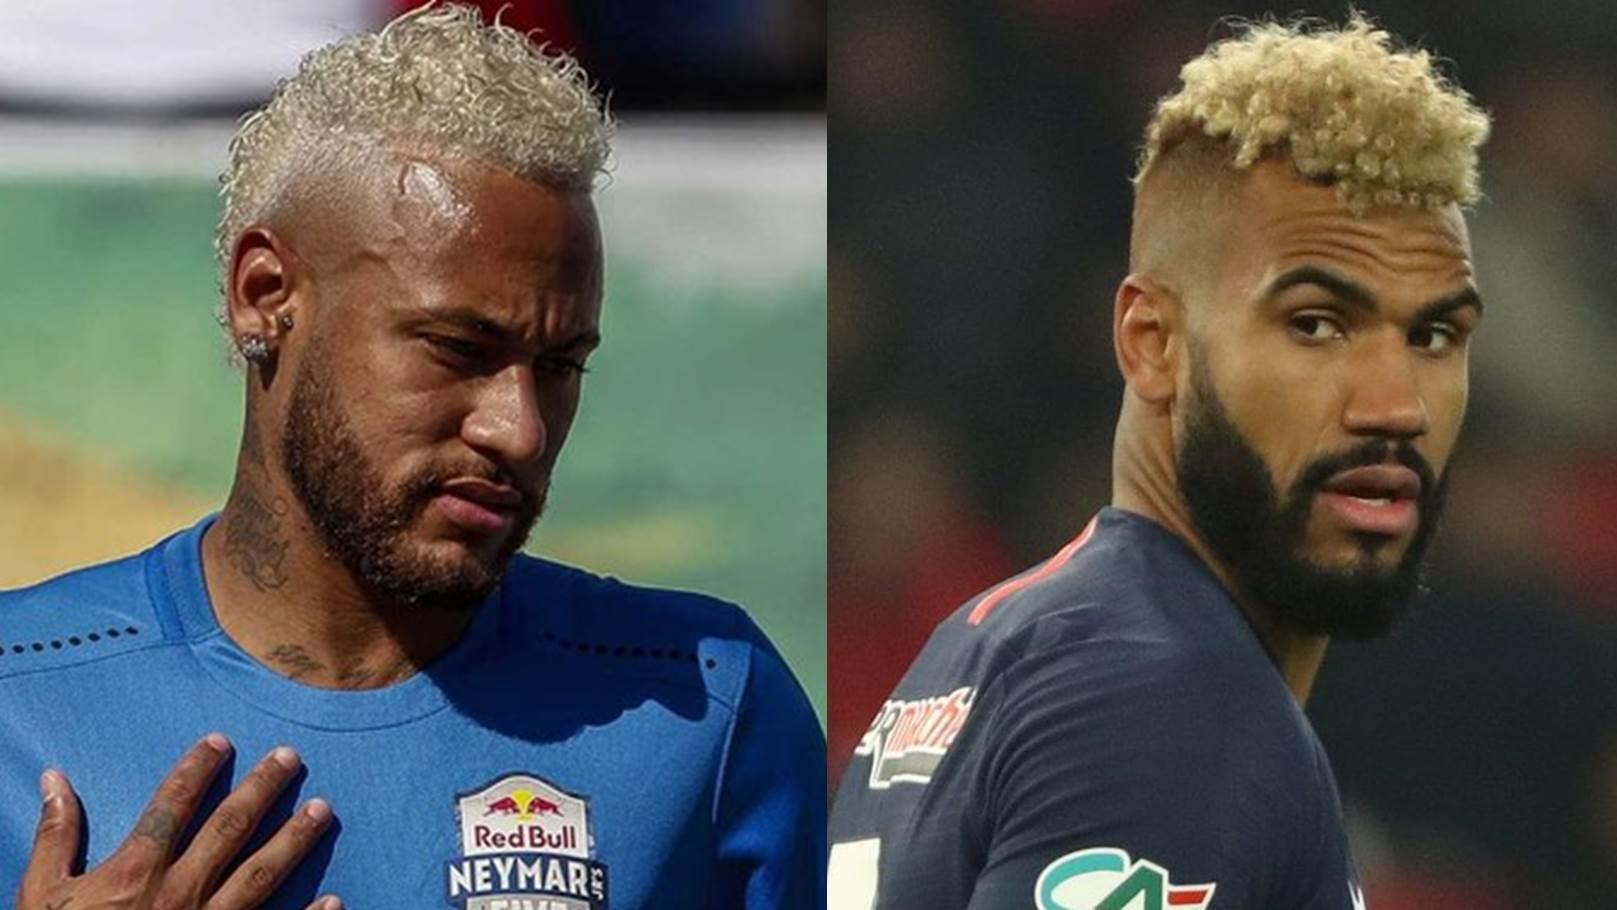 https://jnewsfoot com/2019/09/06/neymar-jespere-quicardi-et